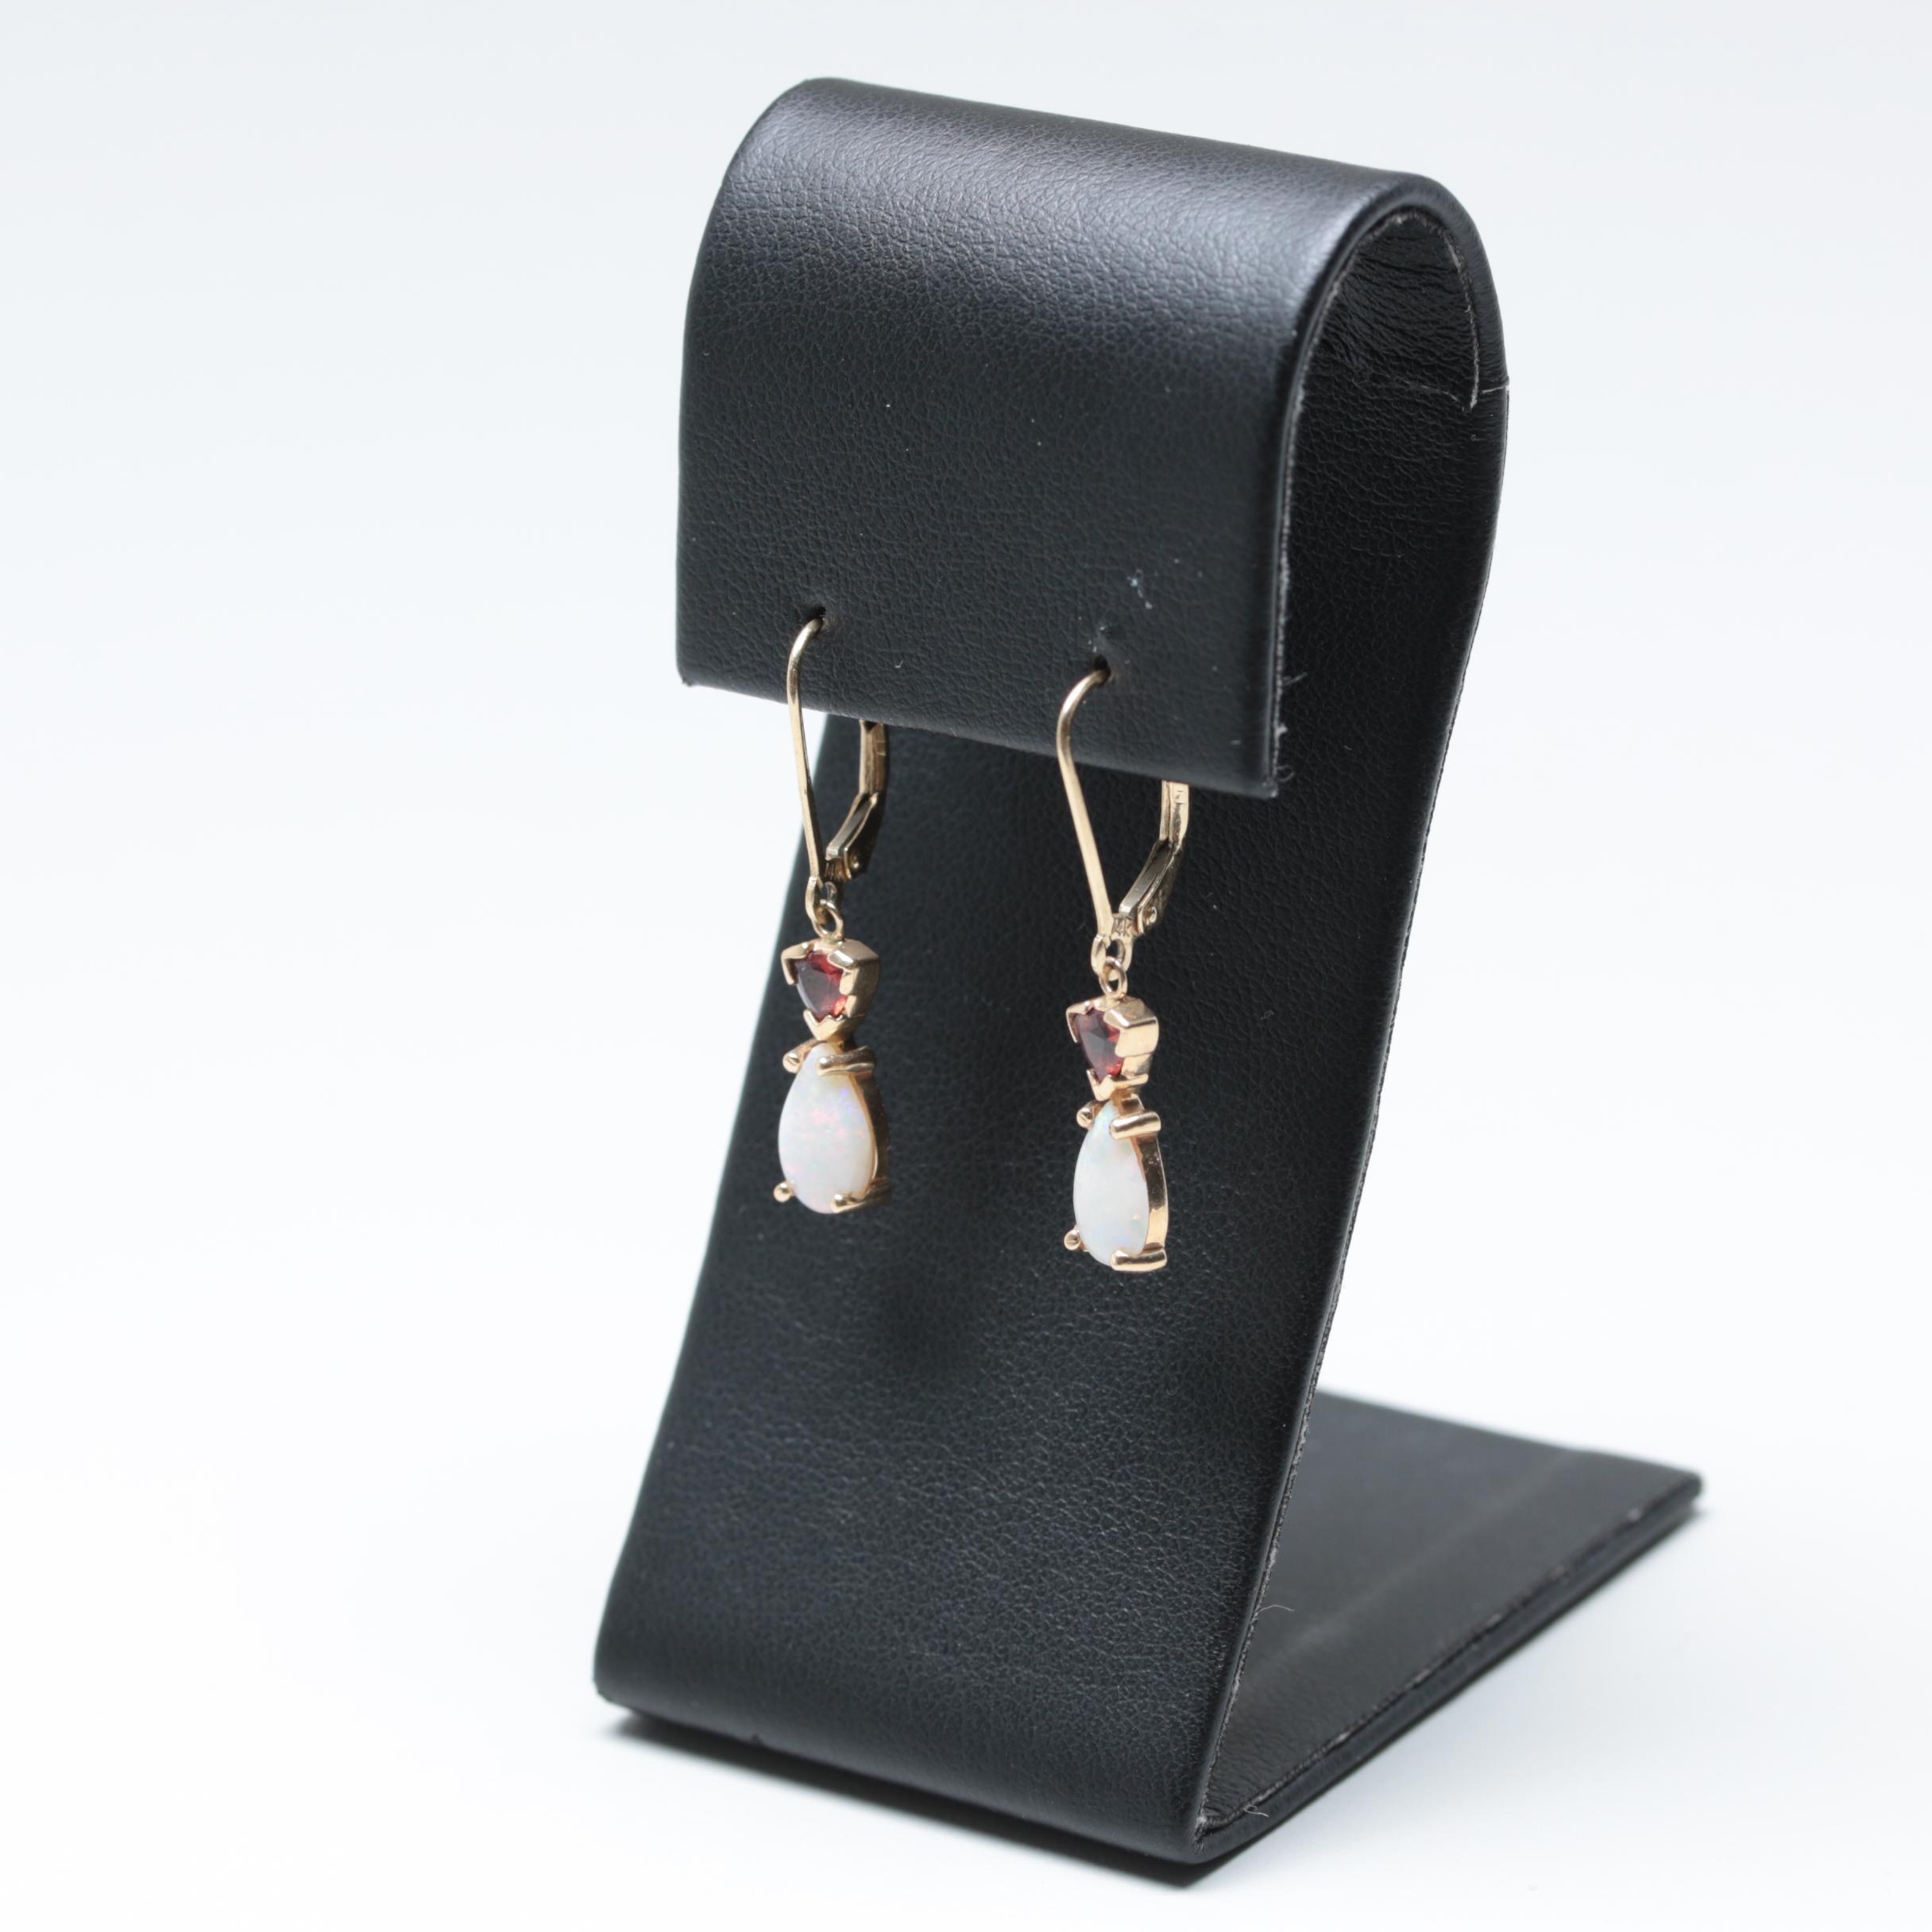 14K Yellow Gold Opal and Garnet Dangle Leverback Earrings